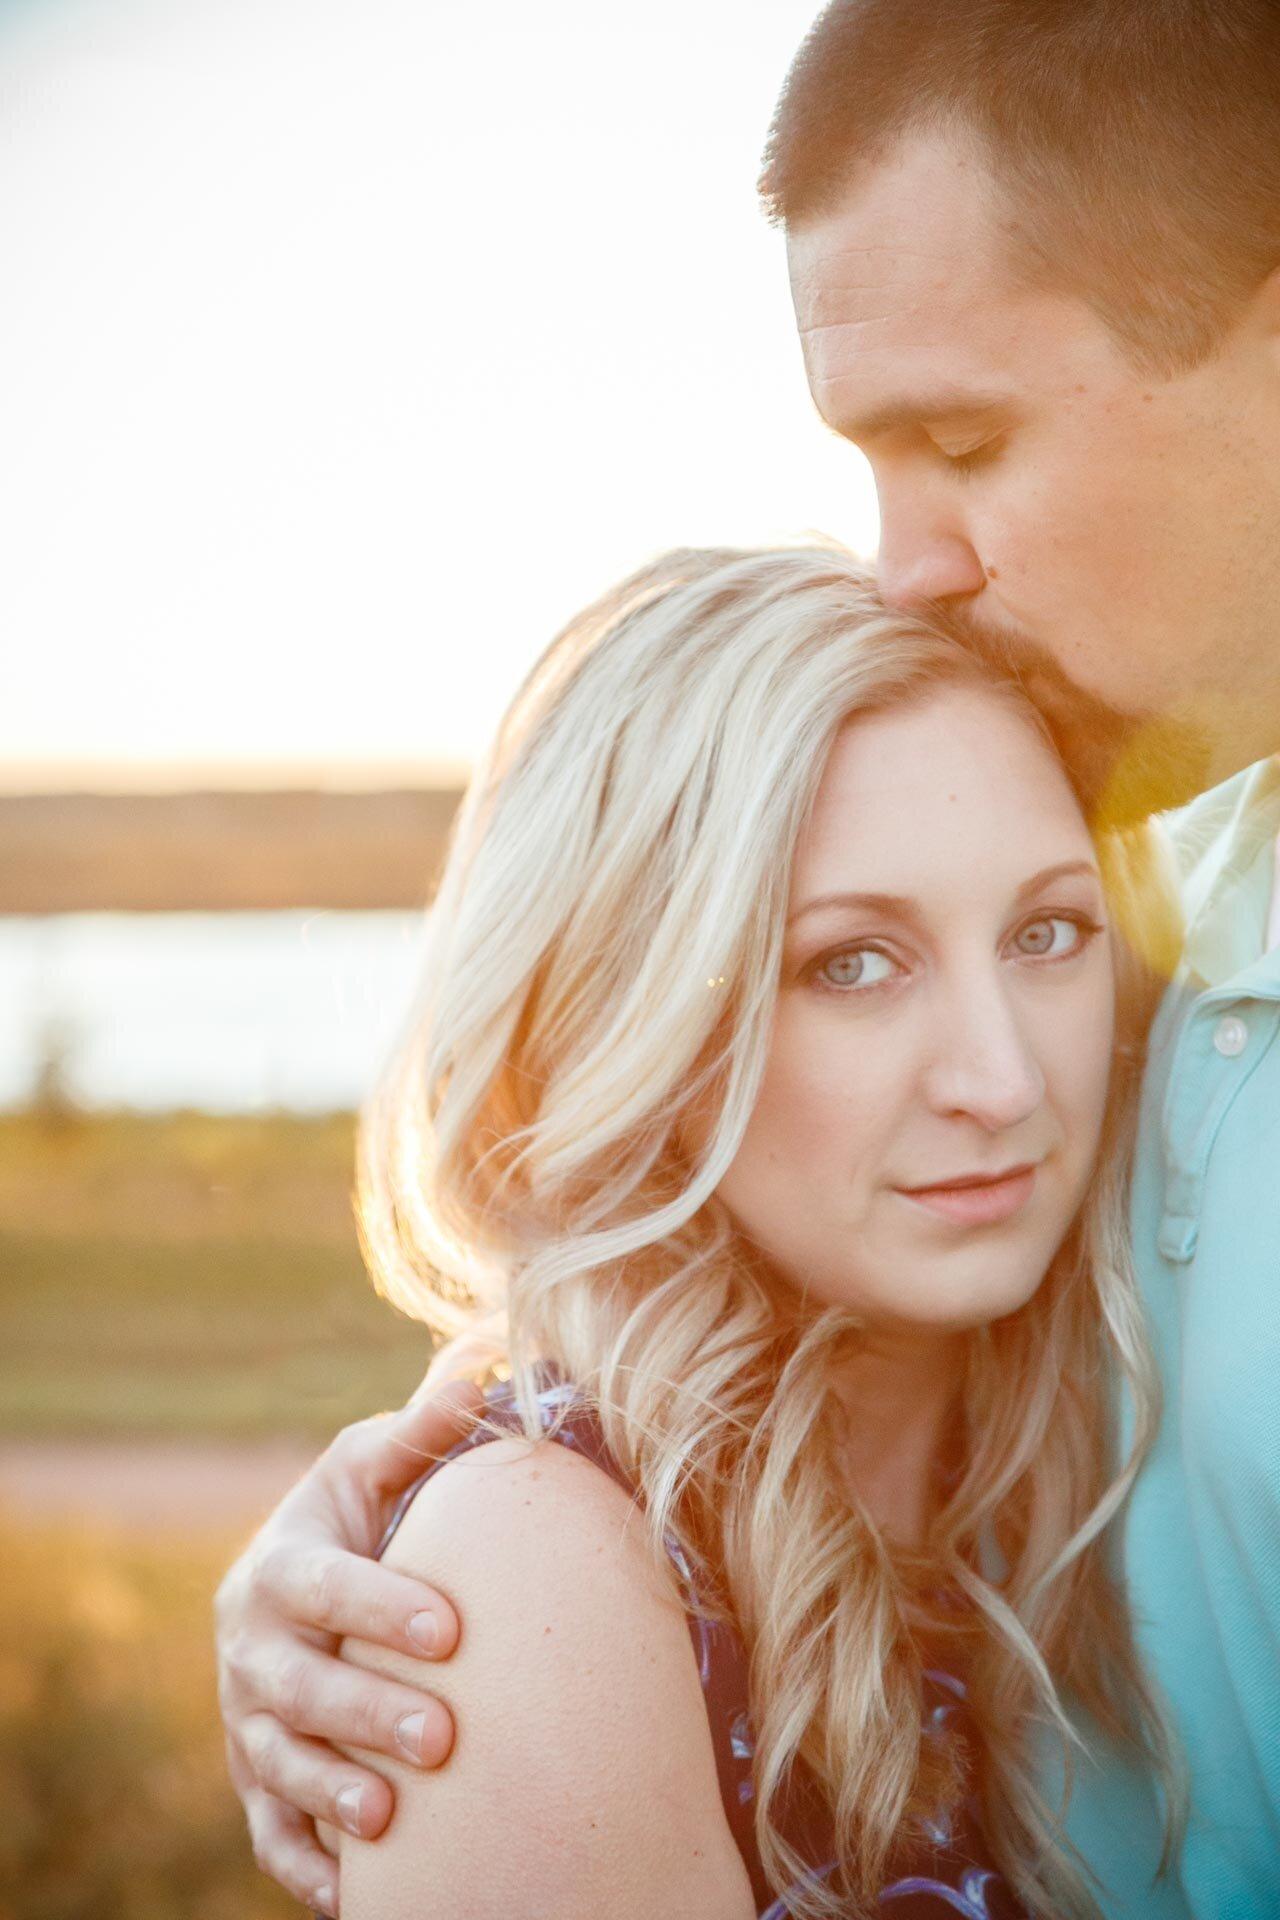 fall-lighting-adam-shea-photography-wedding-engagement-blog-adam-shea-photography-green-bay-appleton-neenah-photographer-05.jpg